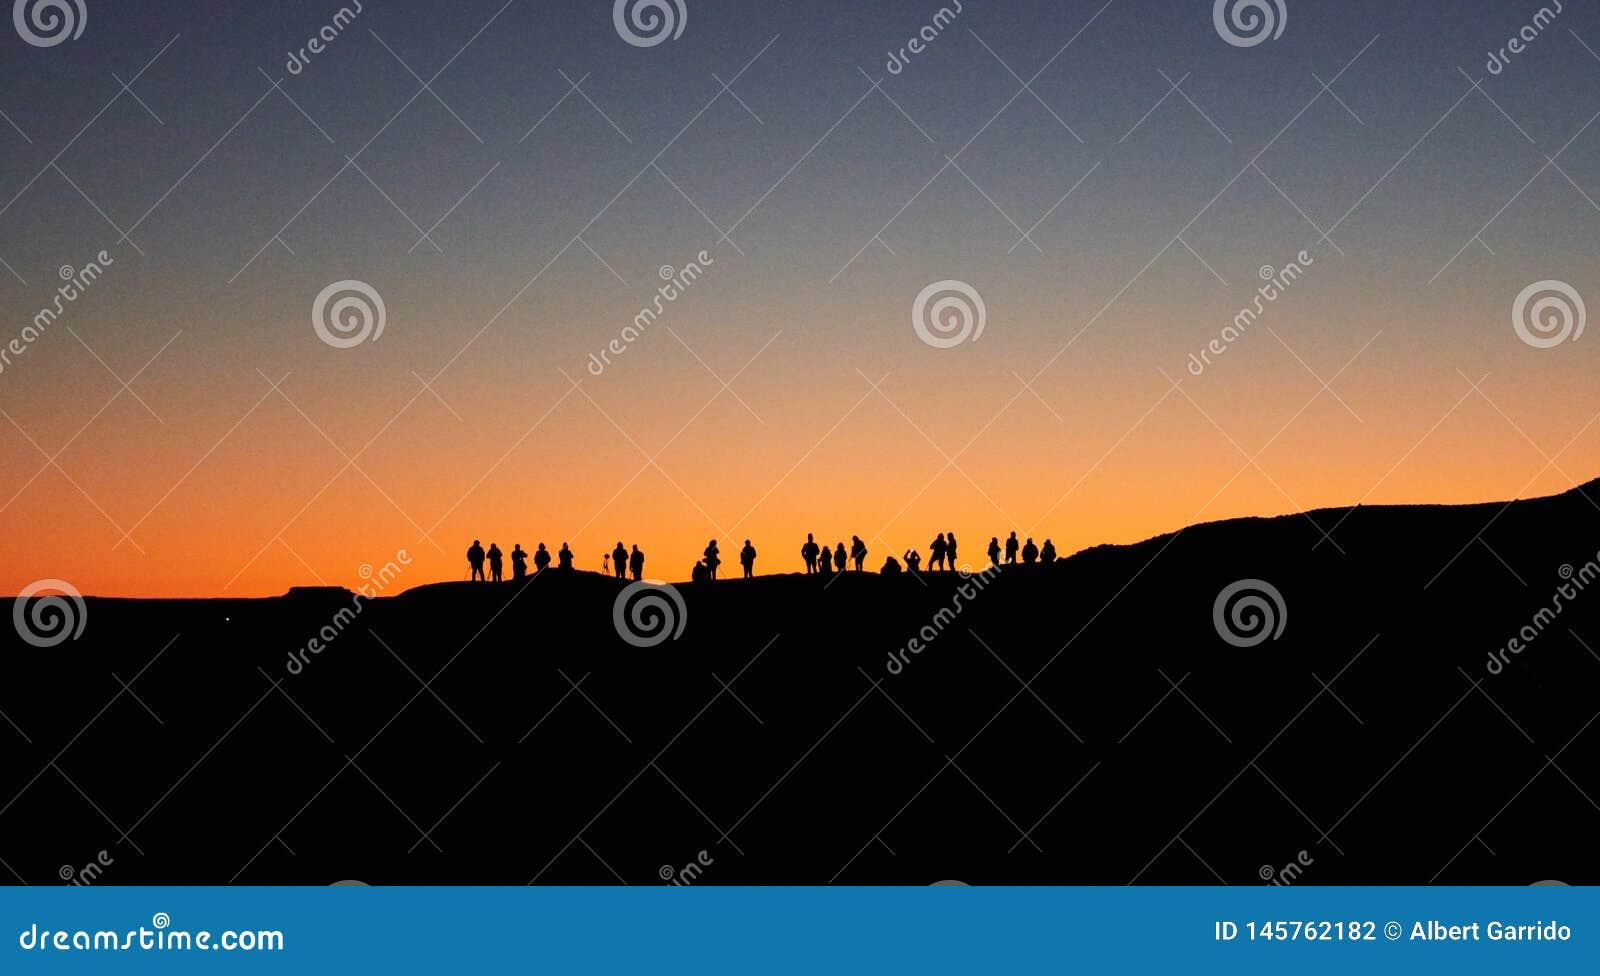 Merzouga, Μαρόκο - 4 Δεκεμβρίου 2018: backlight πολλοί άνθρωποι που περιμένουν την ανατολή